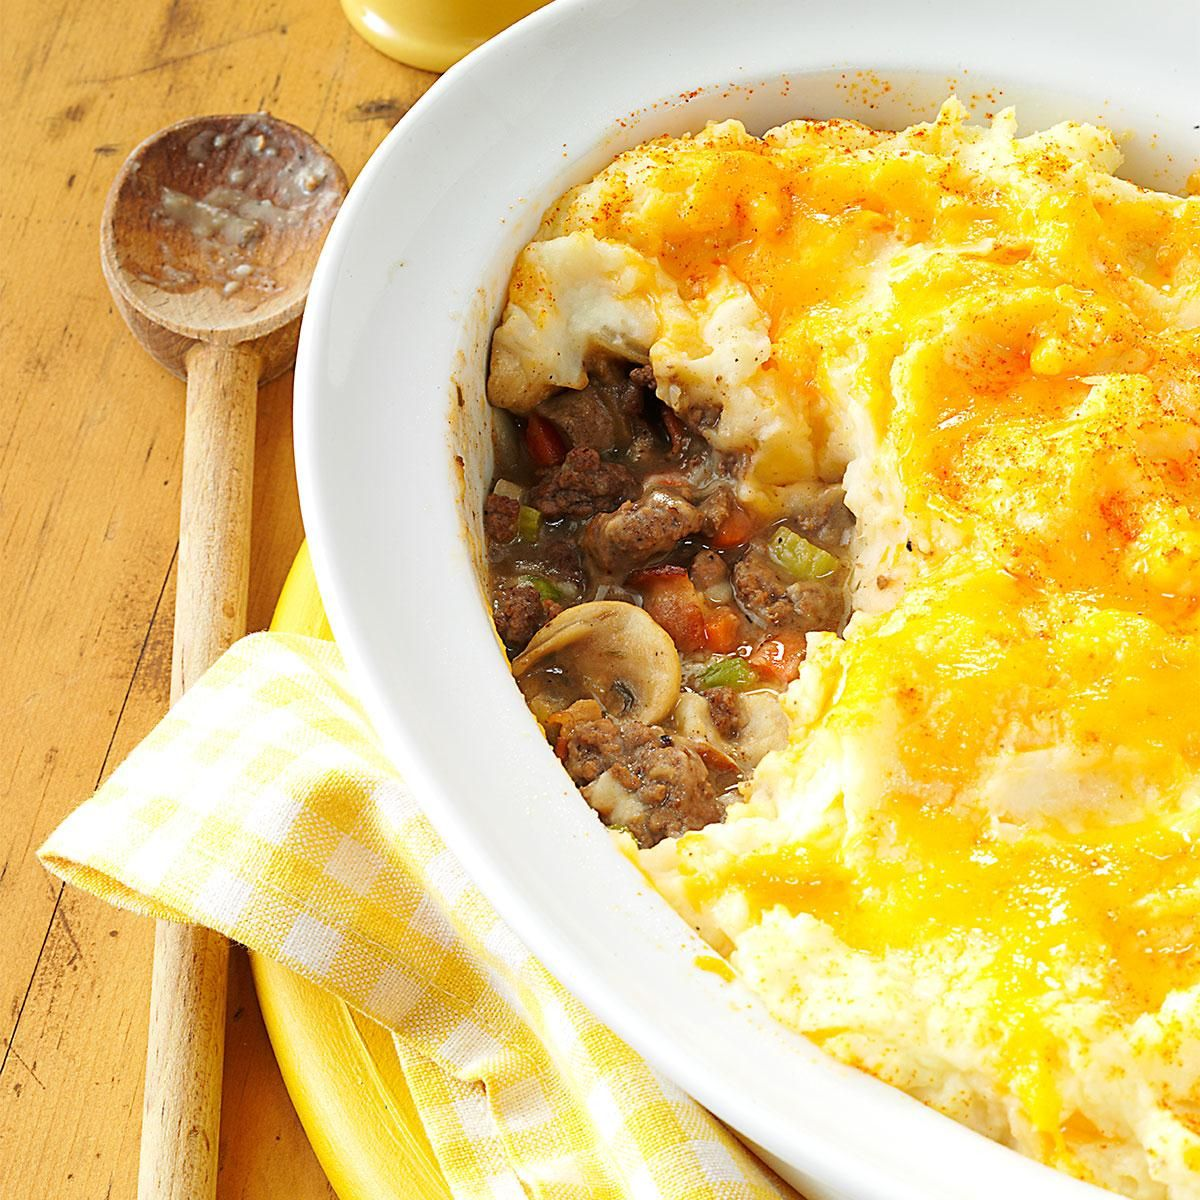 Mashed Potato Beef Casserole Recipe Recipes Mashed Potatoes Beef Casserole